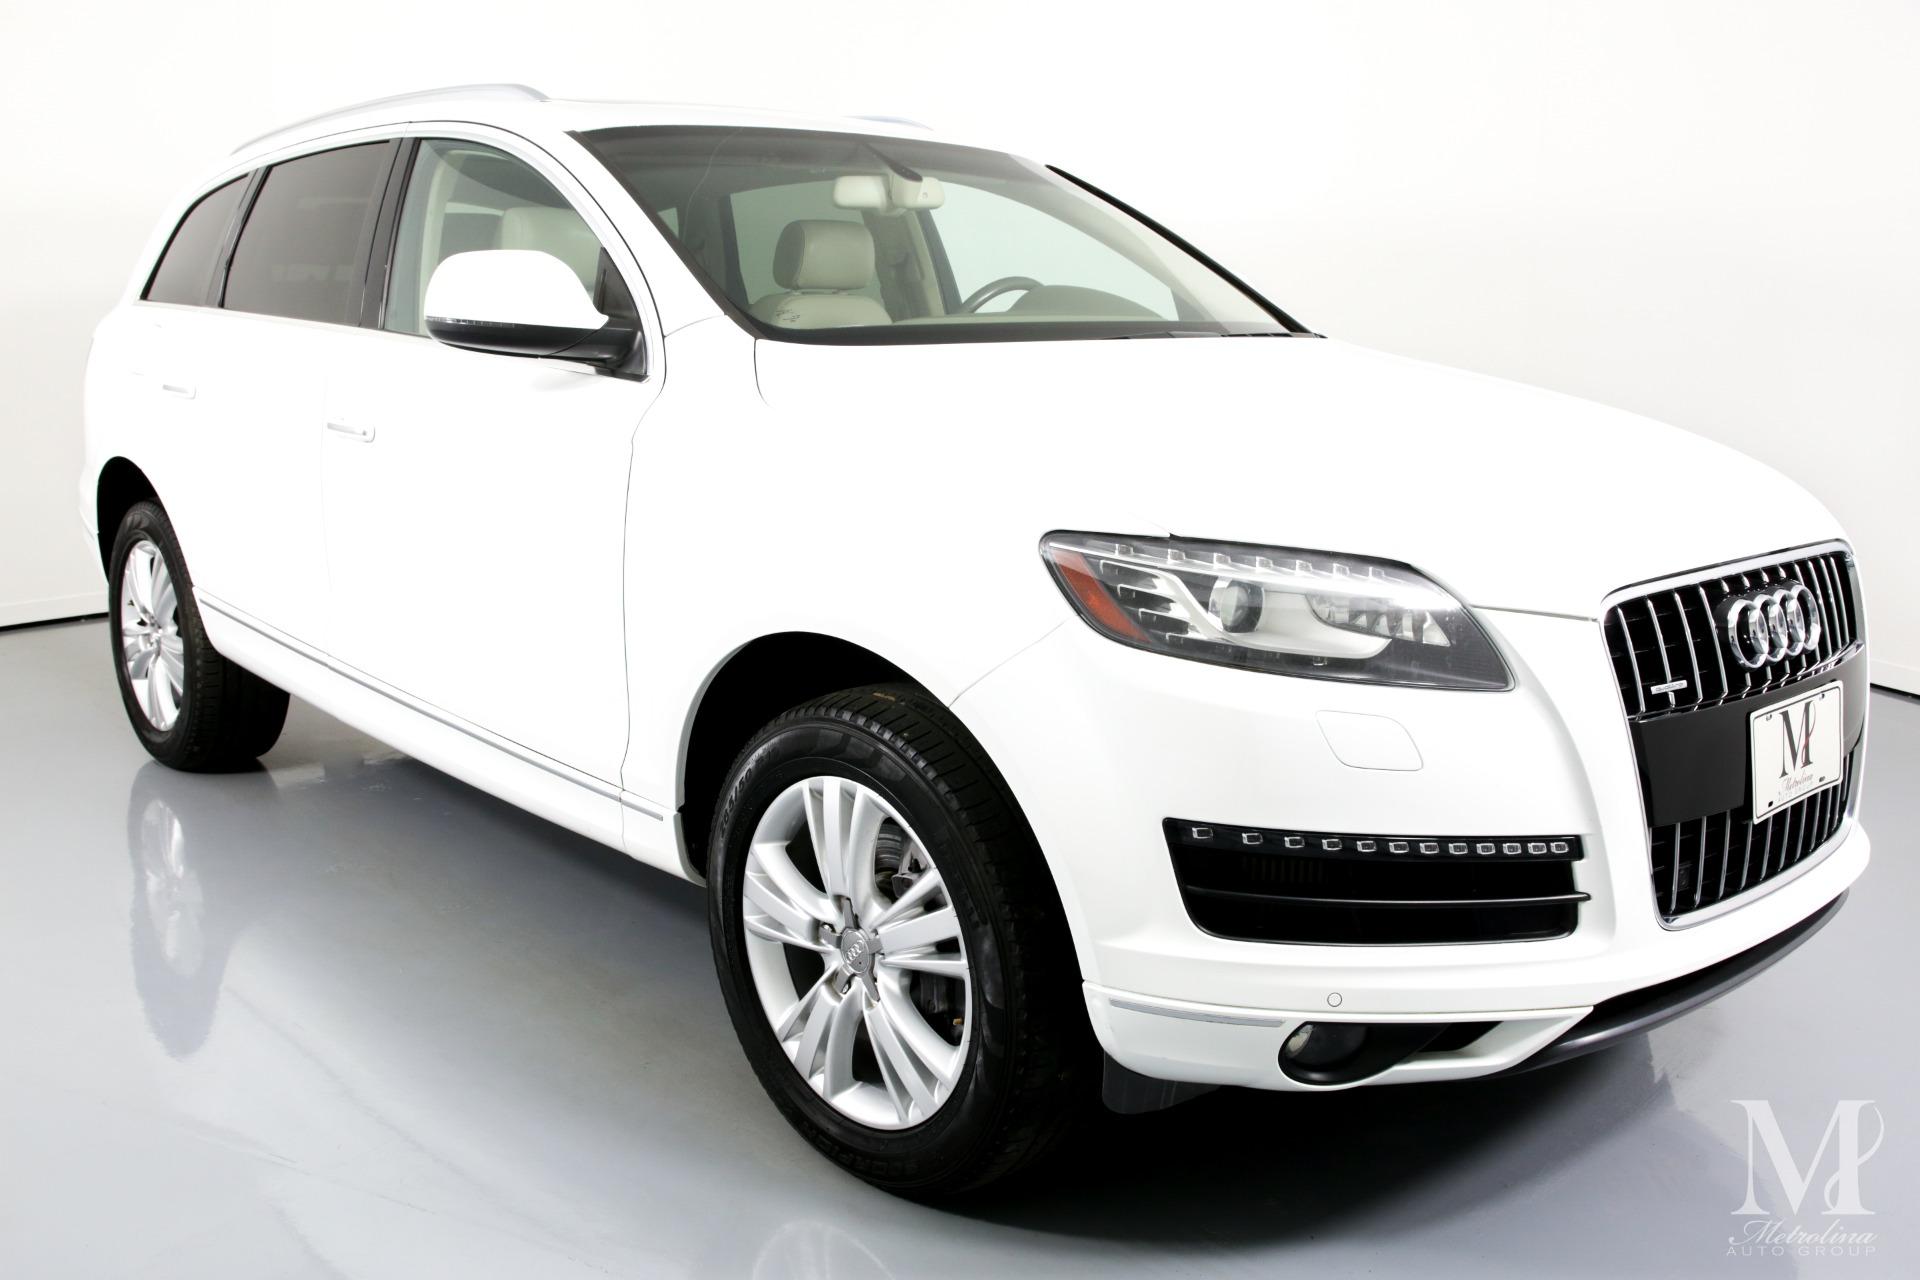 Used 2011 Audi Q7 3.0 quattro TDI Premium Plus AWD 4dr SUV for sale $16,456 at Metrolina Auto Group in Charlotte NC 28217 - 2